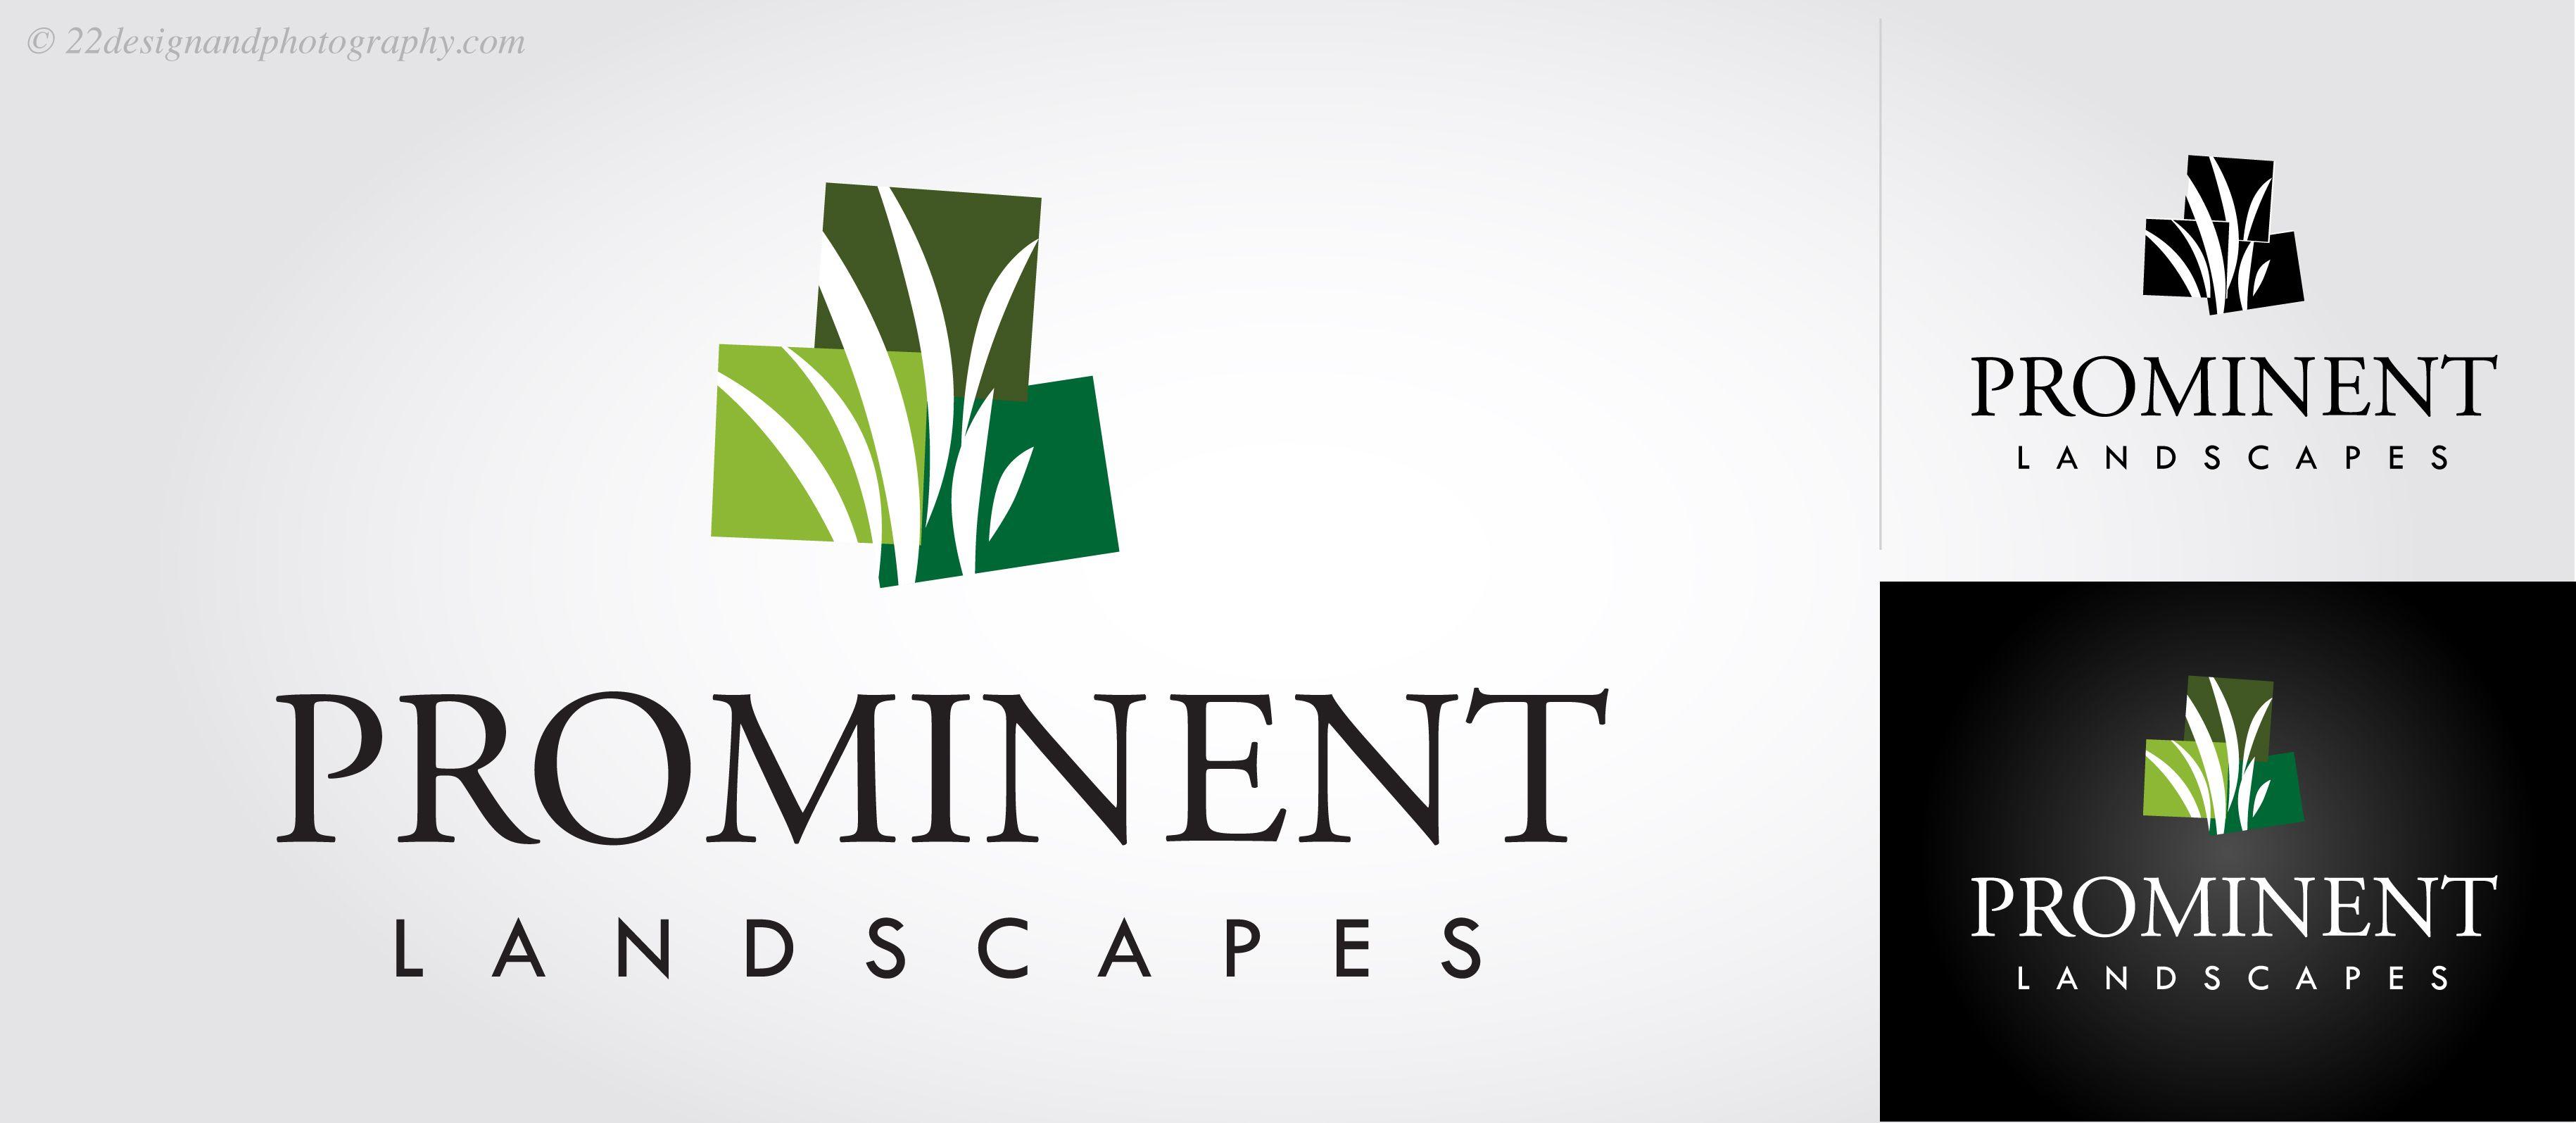 landscape design company logos | bathroom design 2017-2018 ... for Corporate Logo Design Examples  155sfw